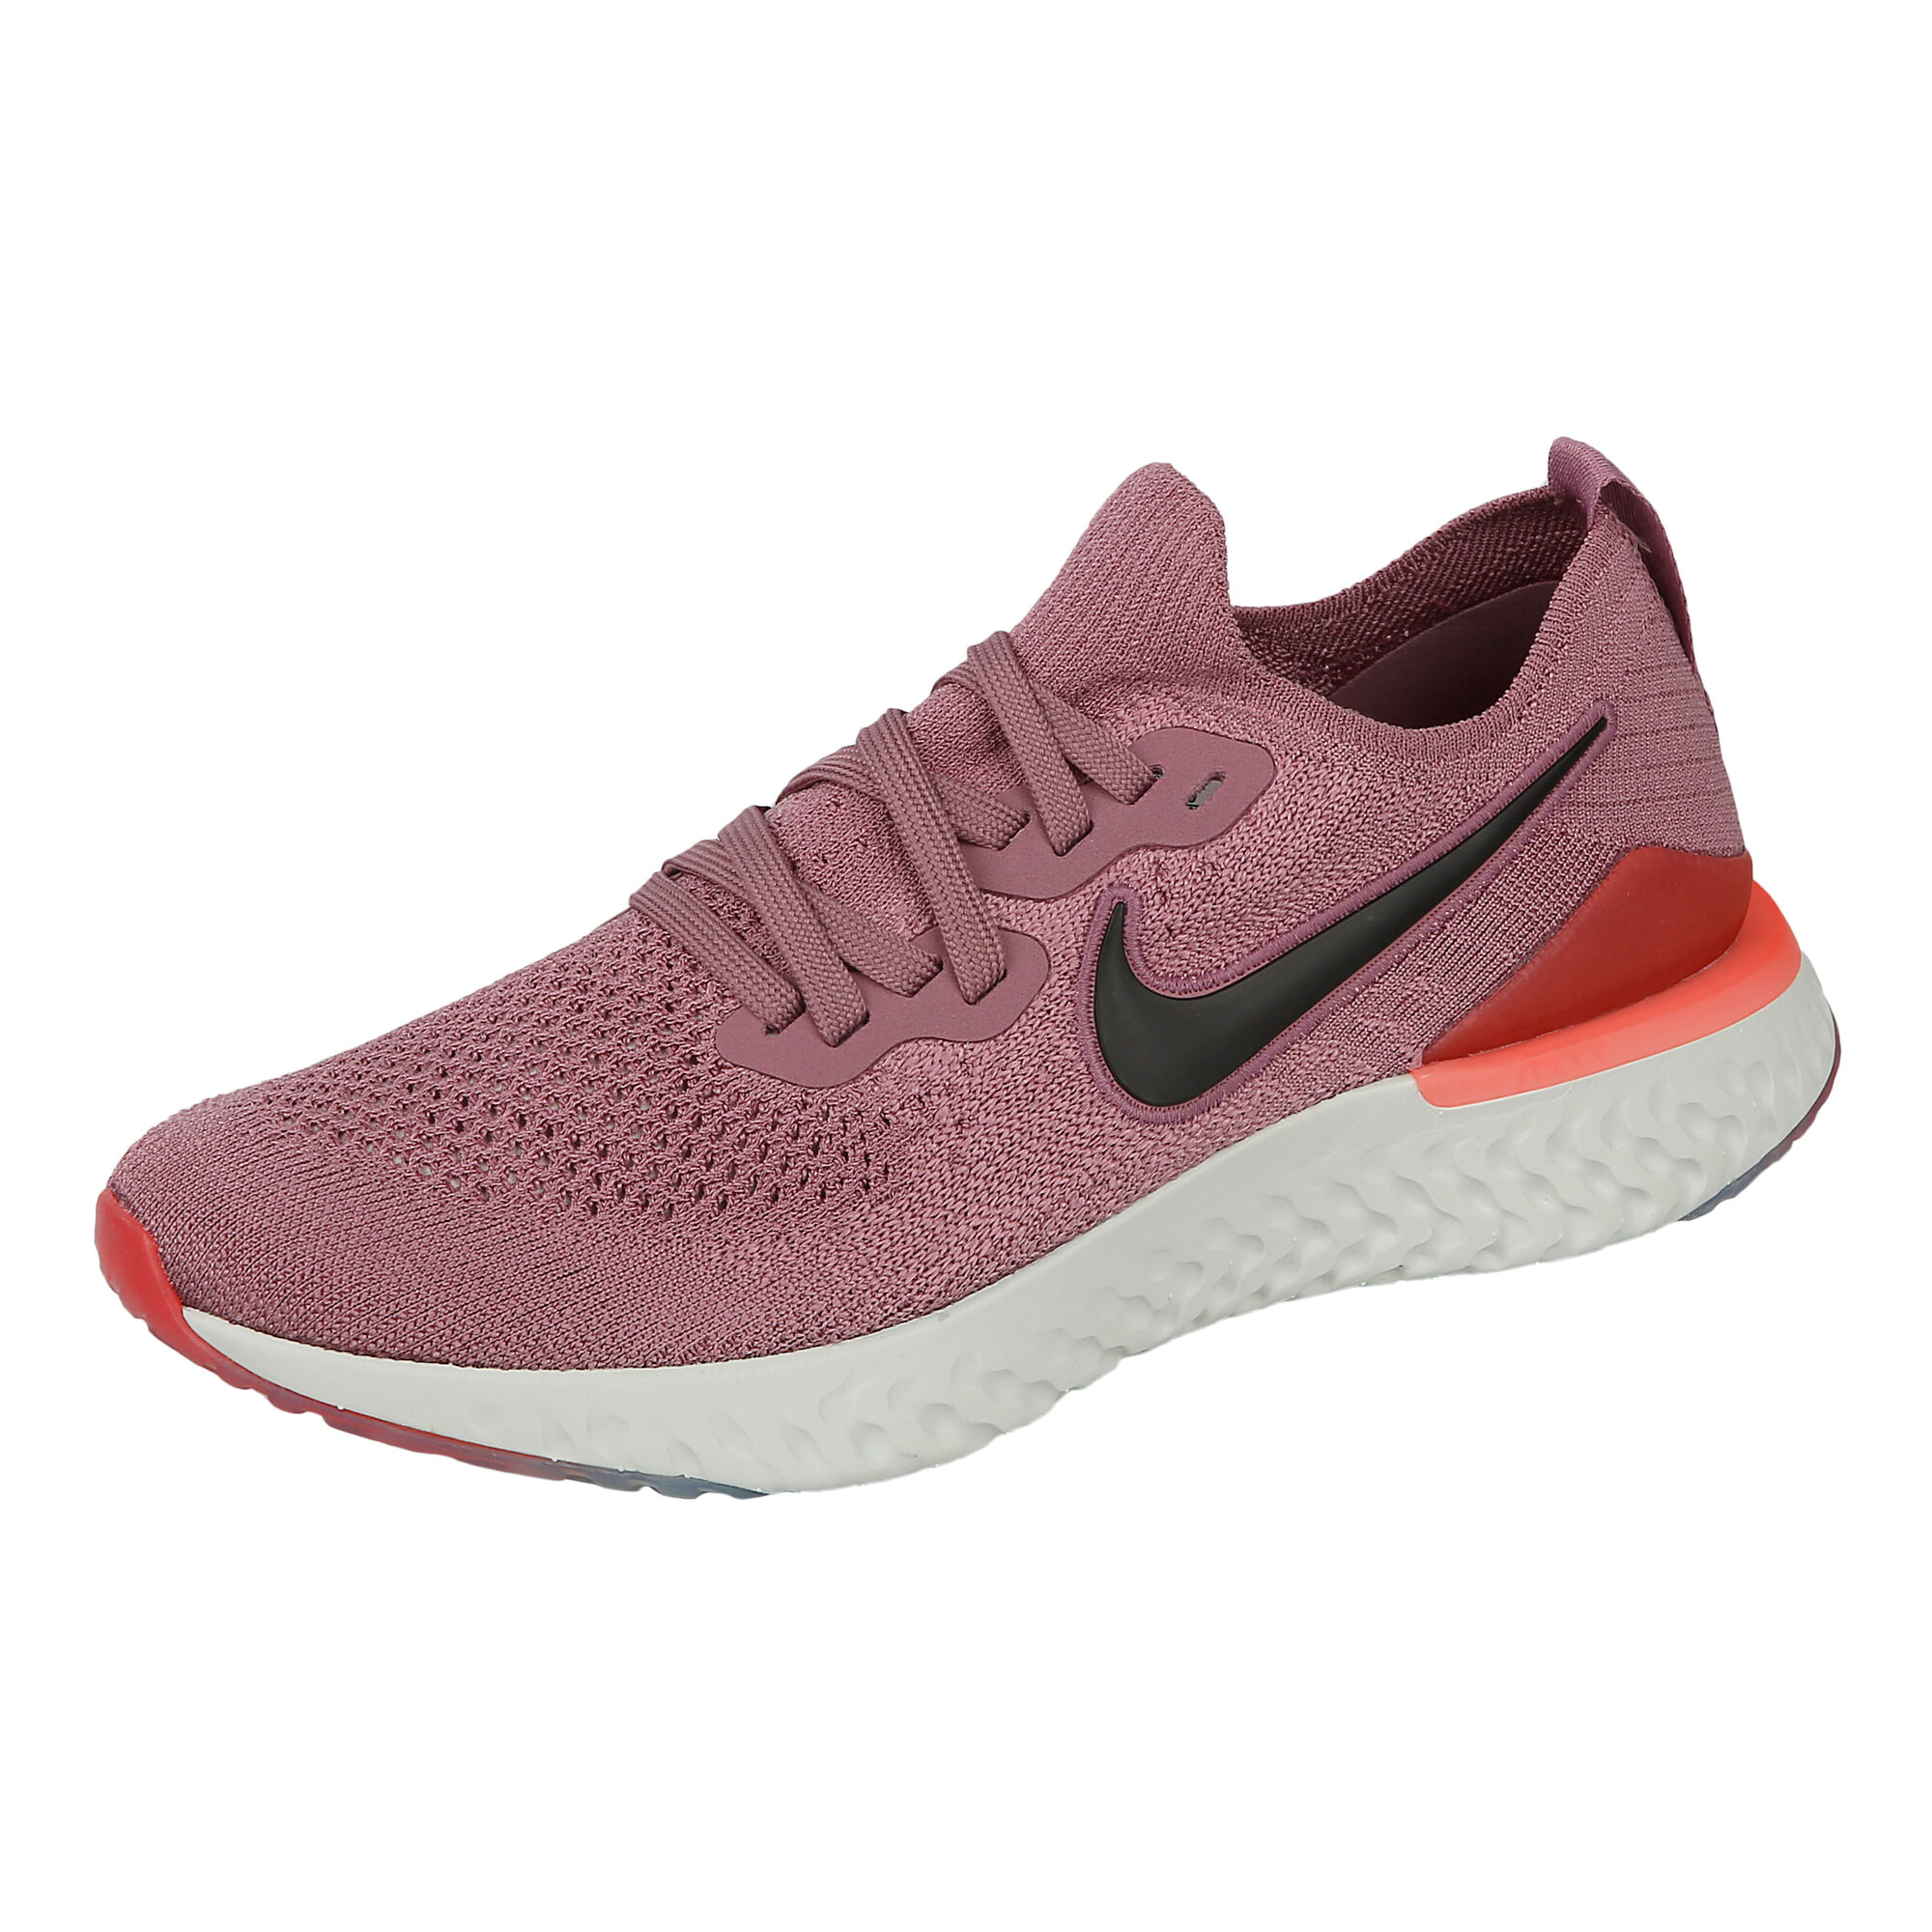 8f4861491a69 Nike · Nike · Nike · Nike · Nike · Nike · Nike · Nike · Nike. Epic React  Flyknit ...